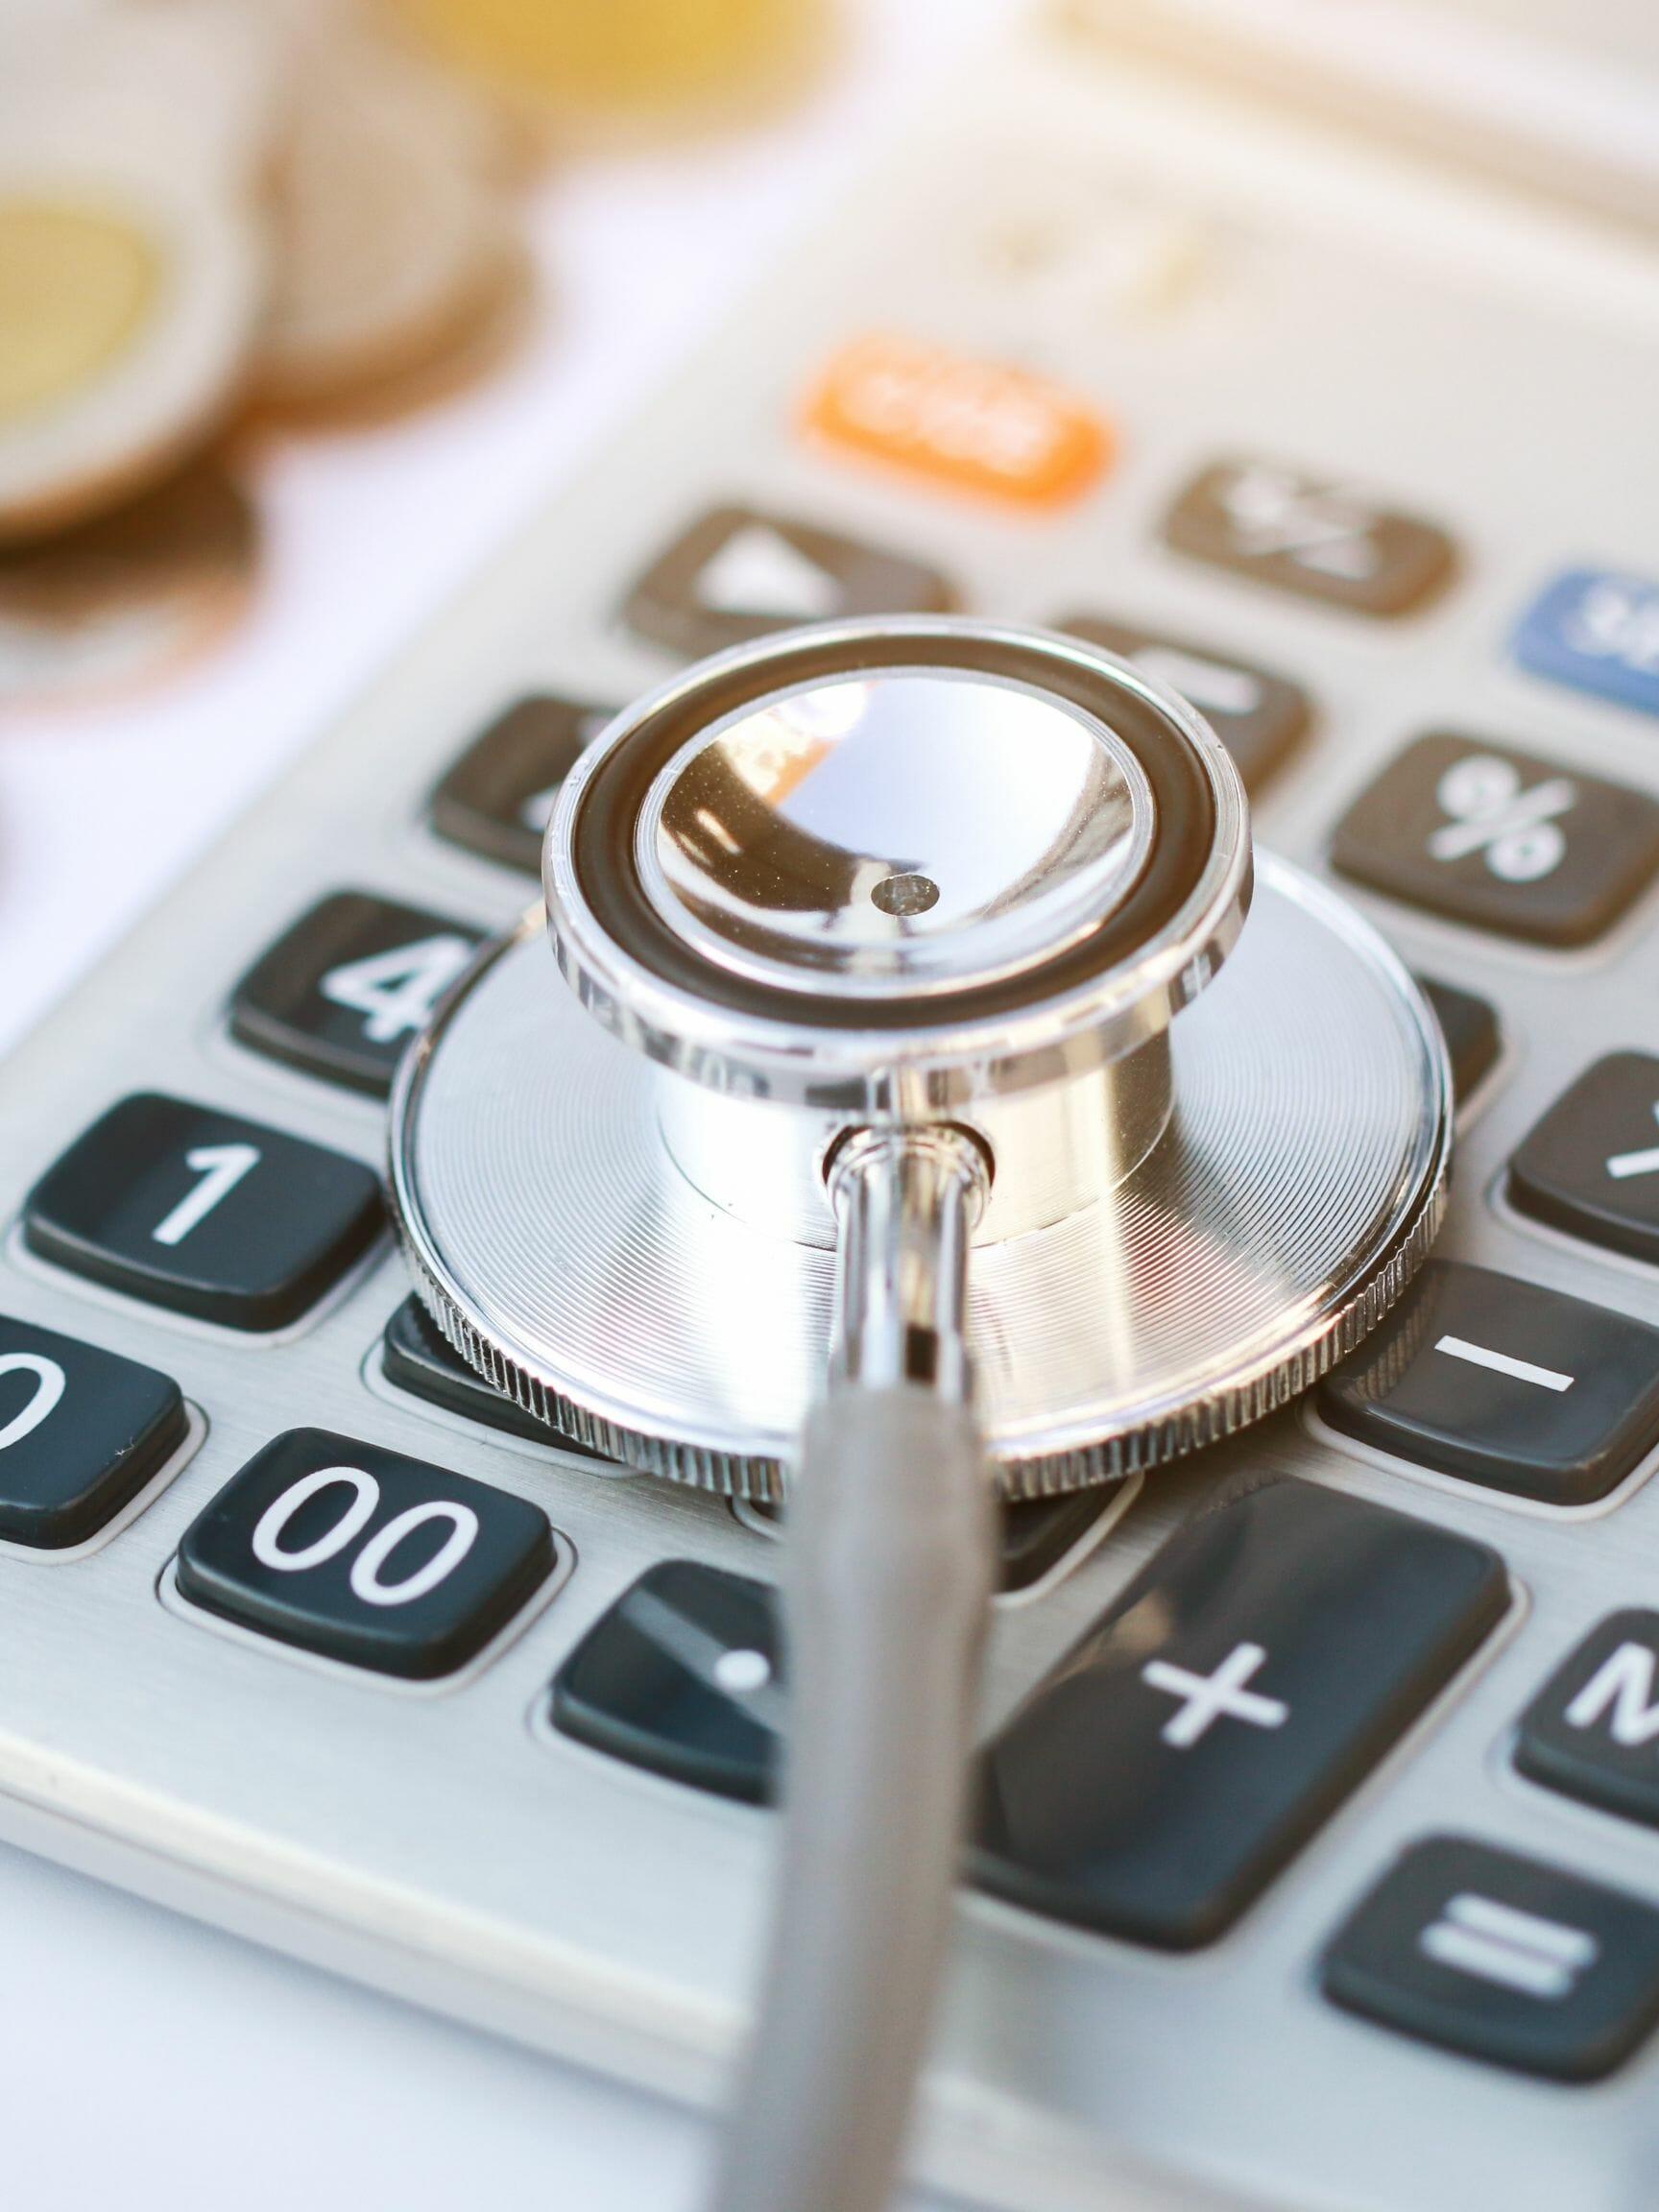 Senior Insurance and Investment Agent – Karen Bernola